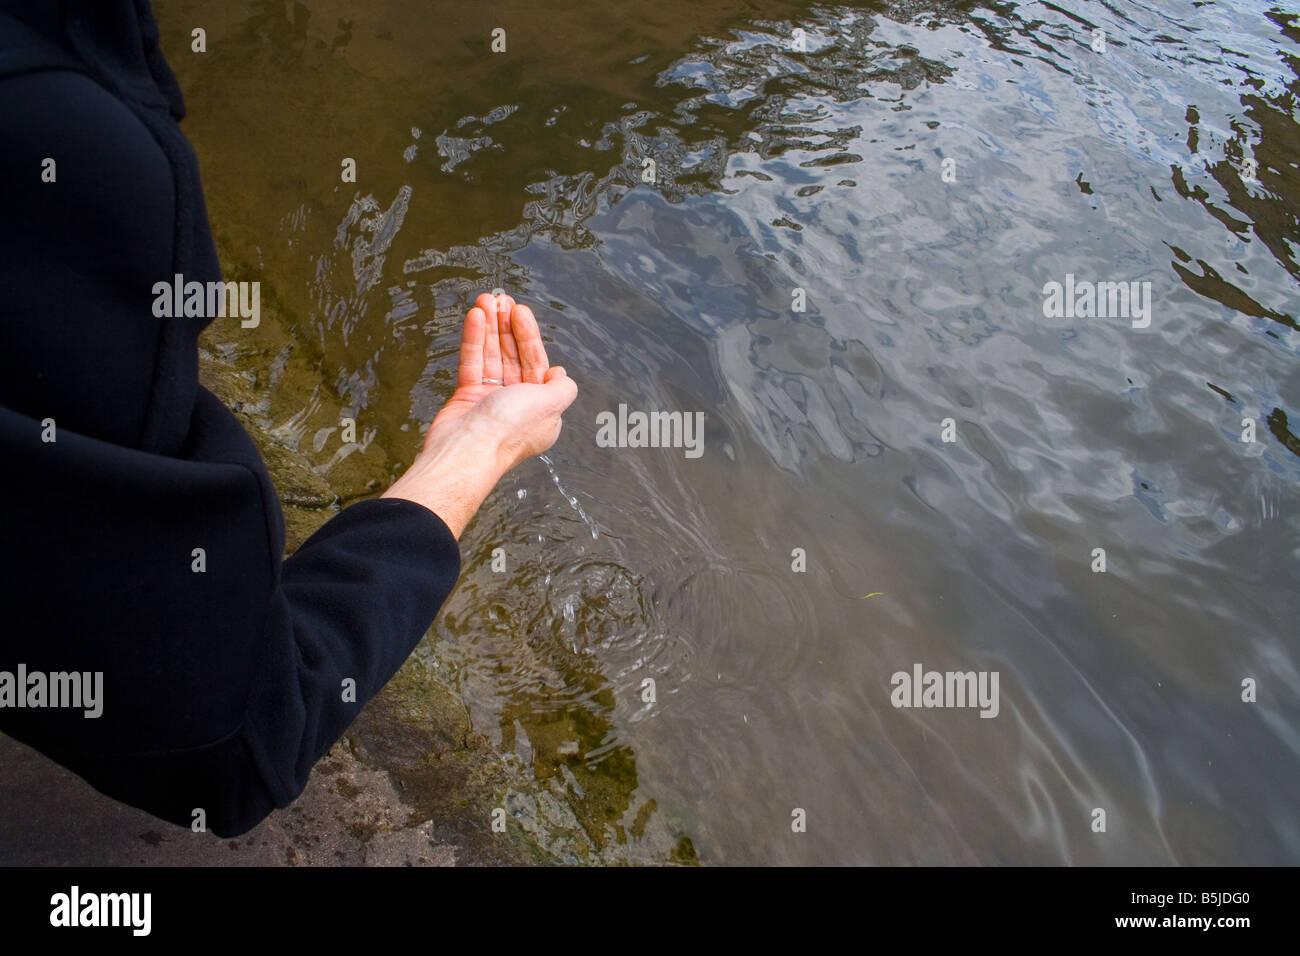 Man scooping the water Strasbourg june 2006 Stock Photo